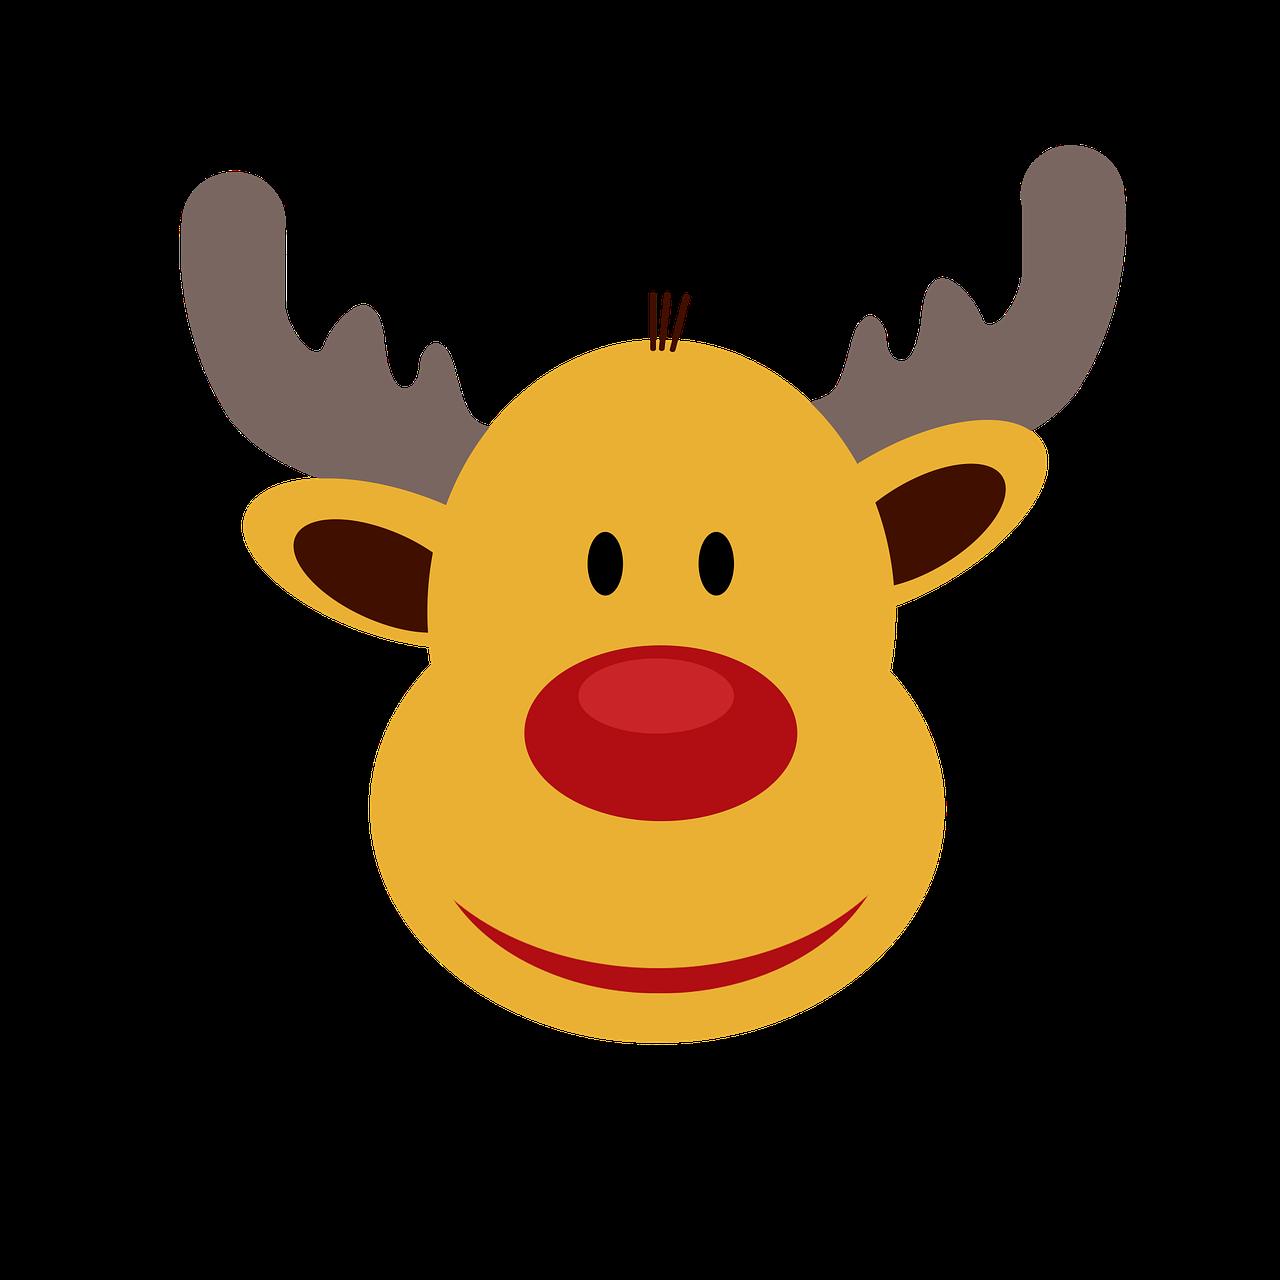 reindeer-1833920_1280